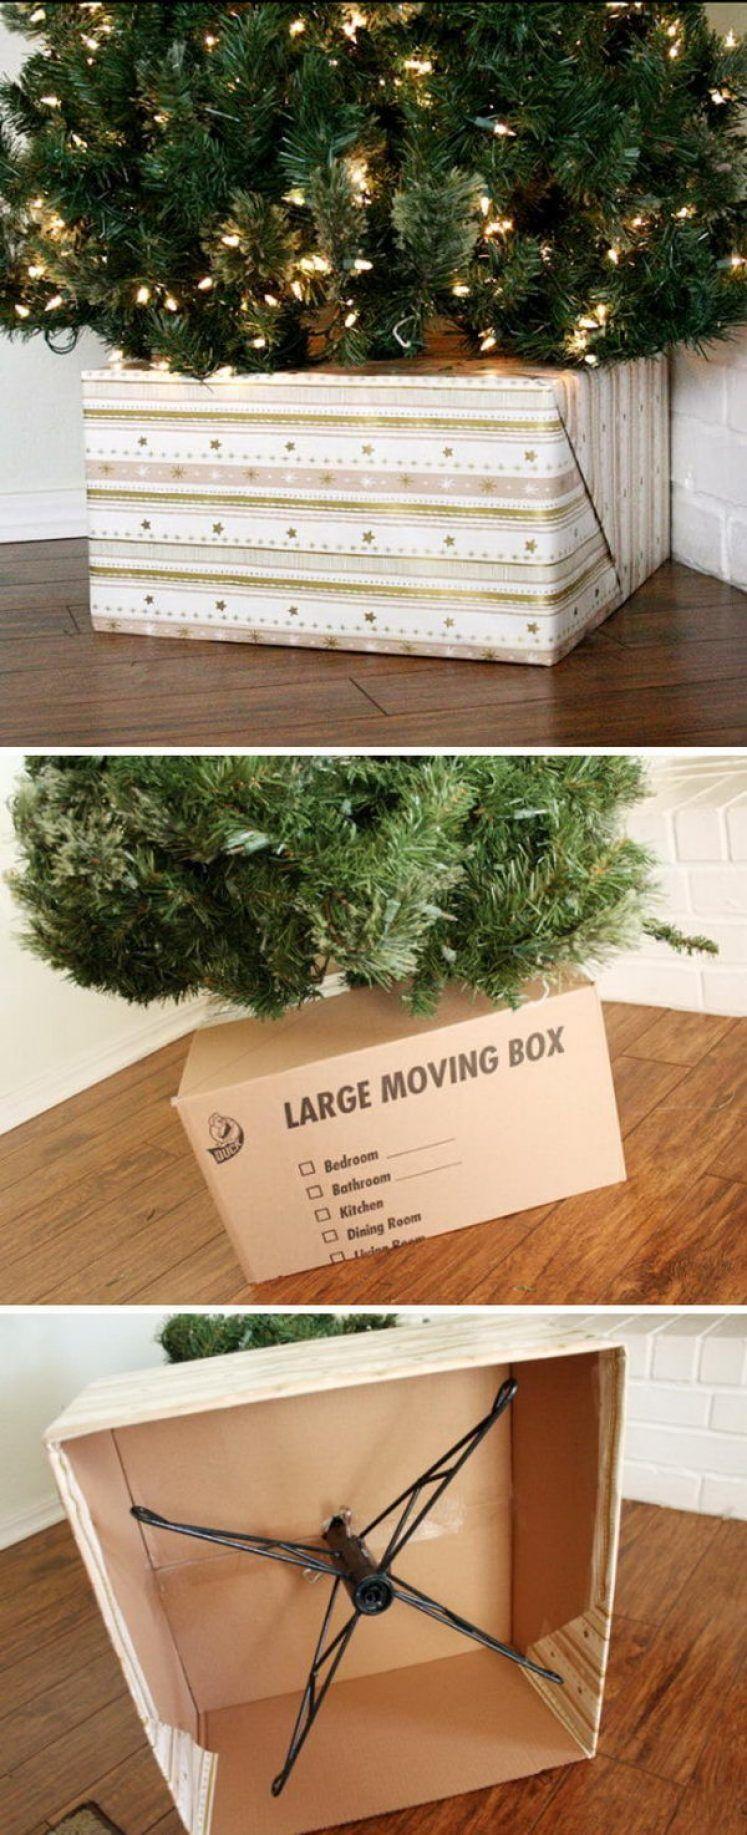 51 Diy Christmas Tree Stand Creative Diy Christmas Tree Stand 12 Ideas New Wrapped Present Lo Christmas Tree Base